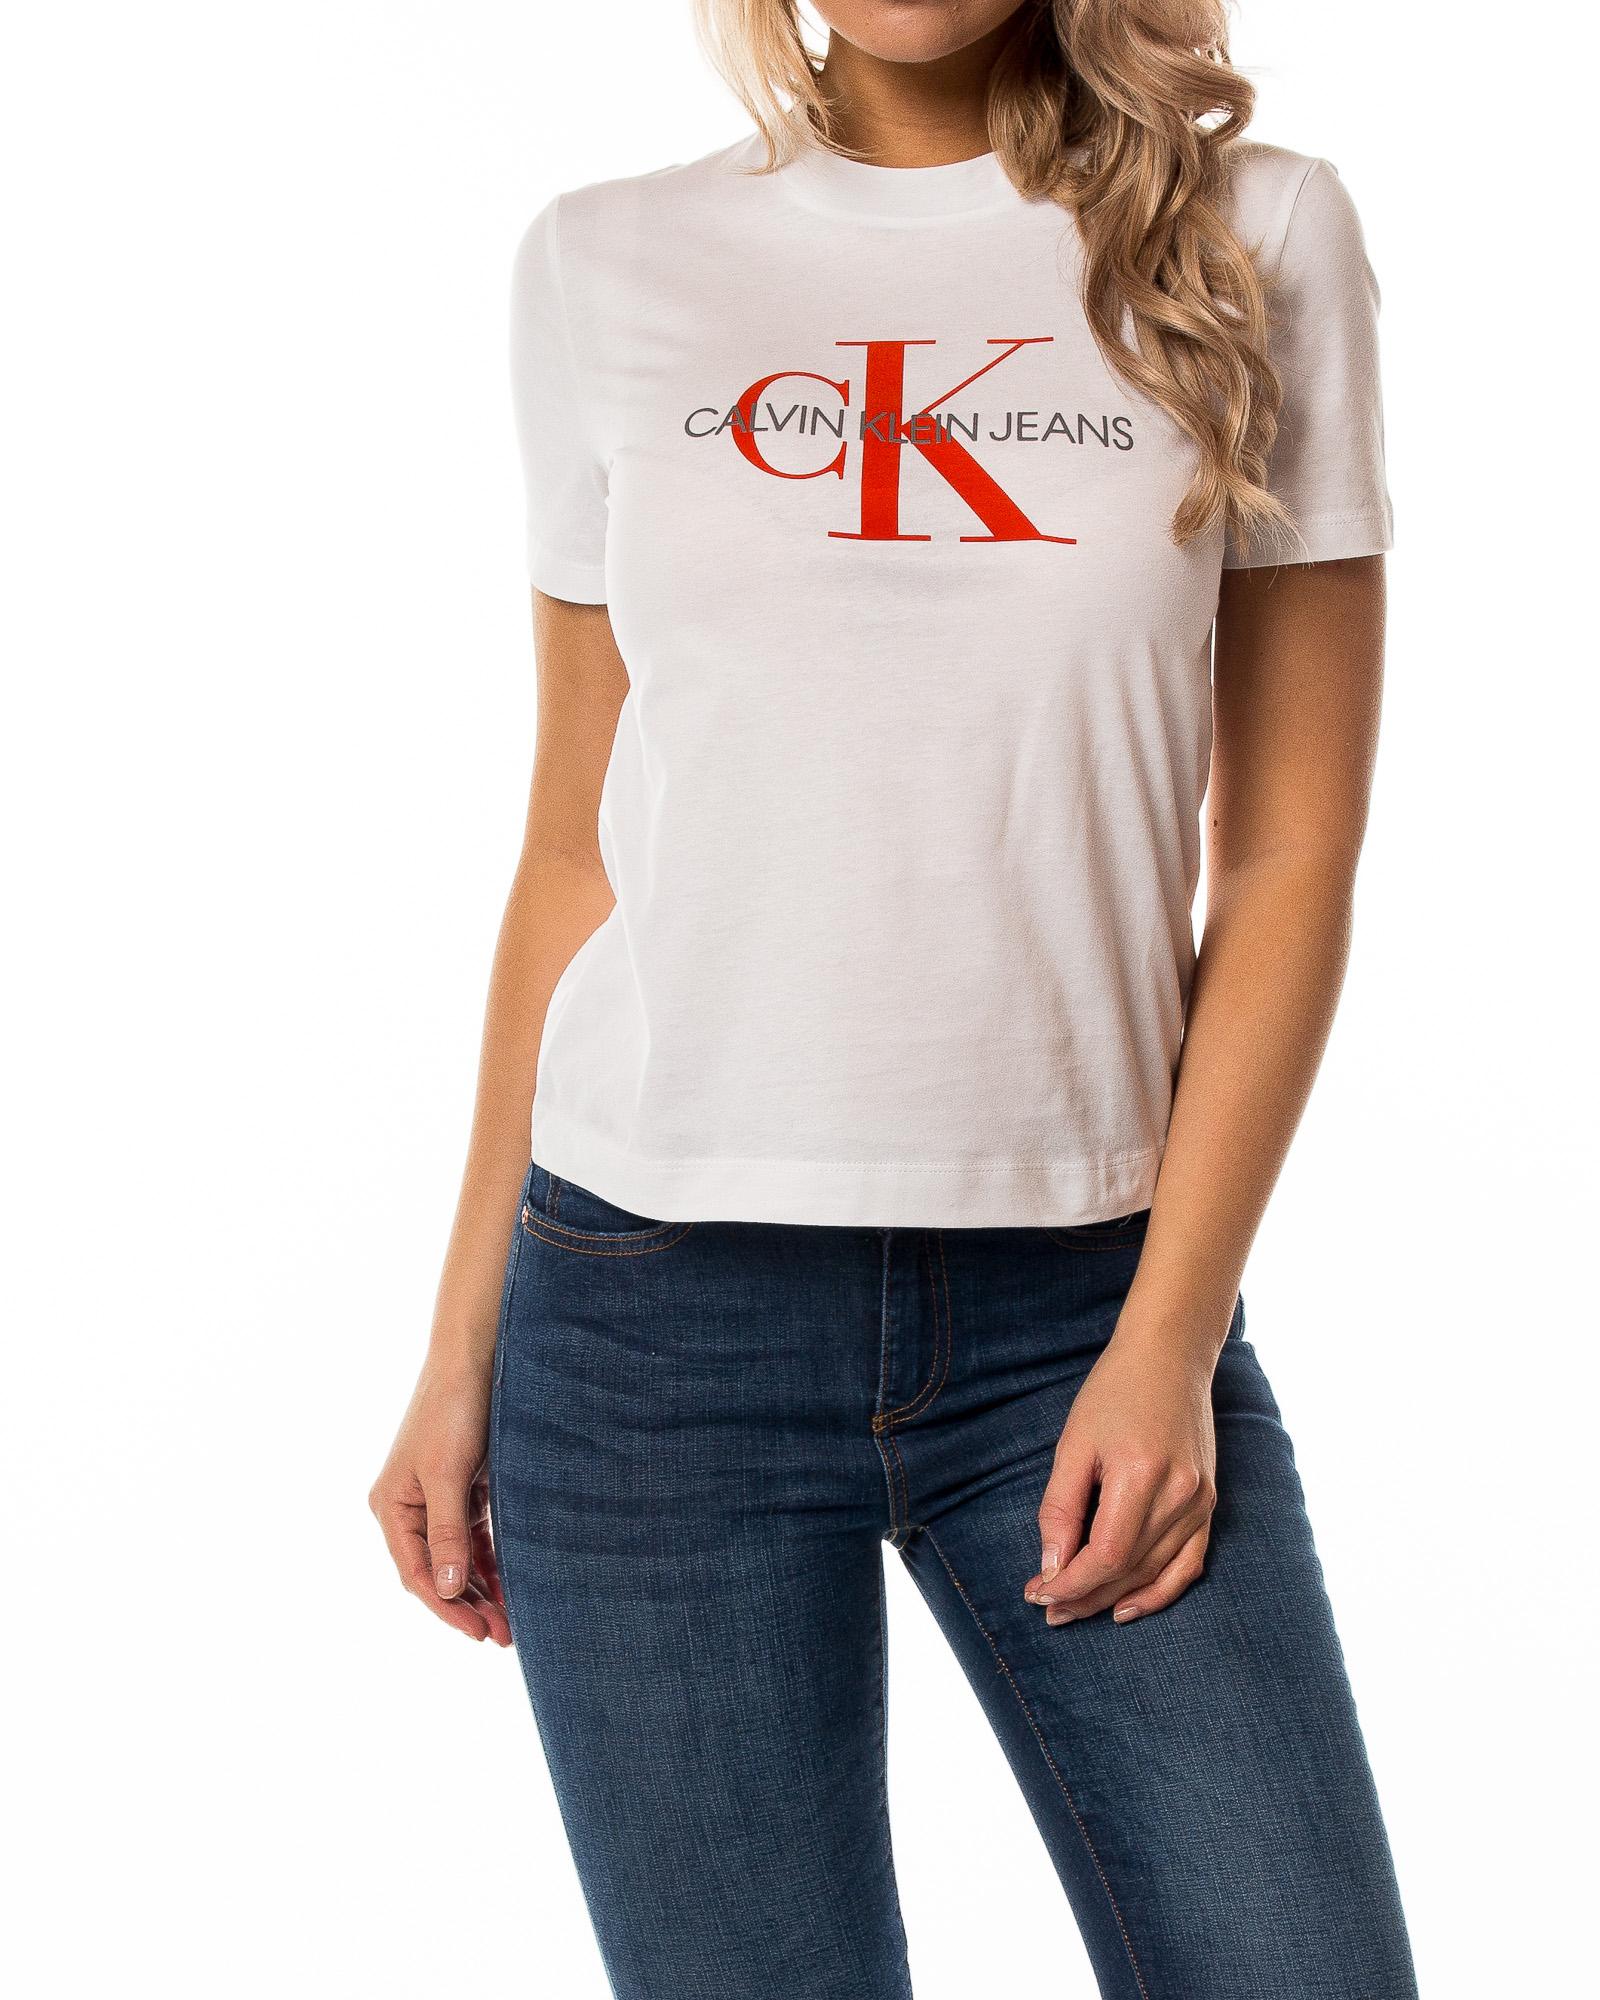 6443e3c2cb6 Calvin Klein Jeans